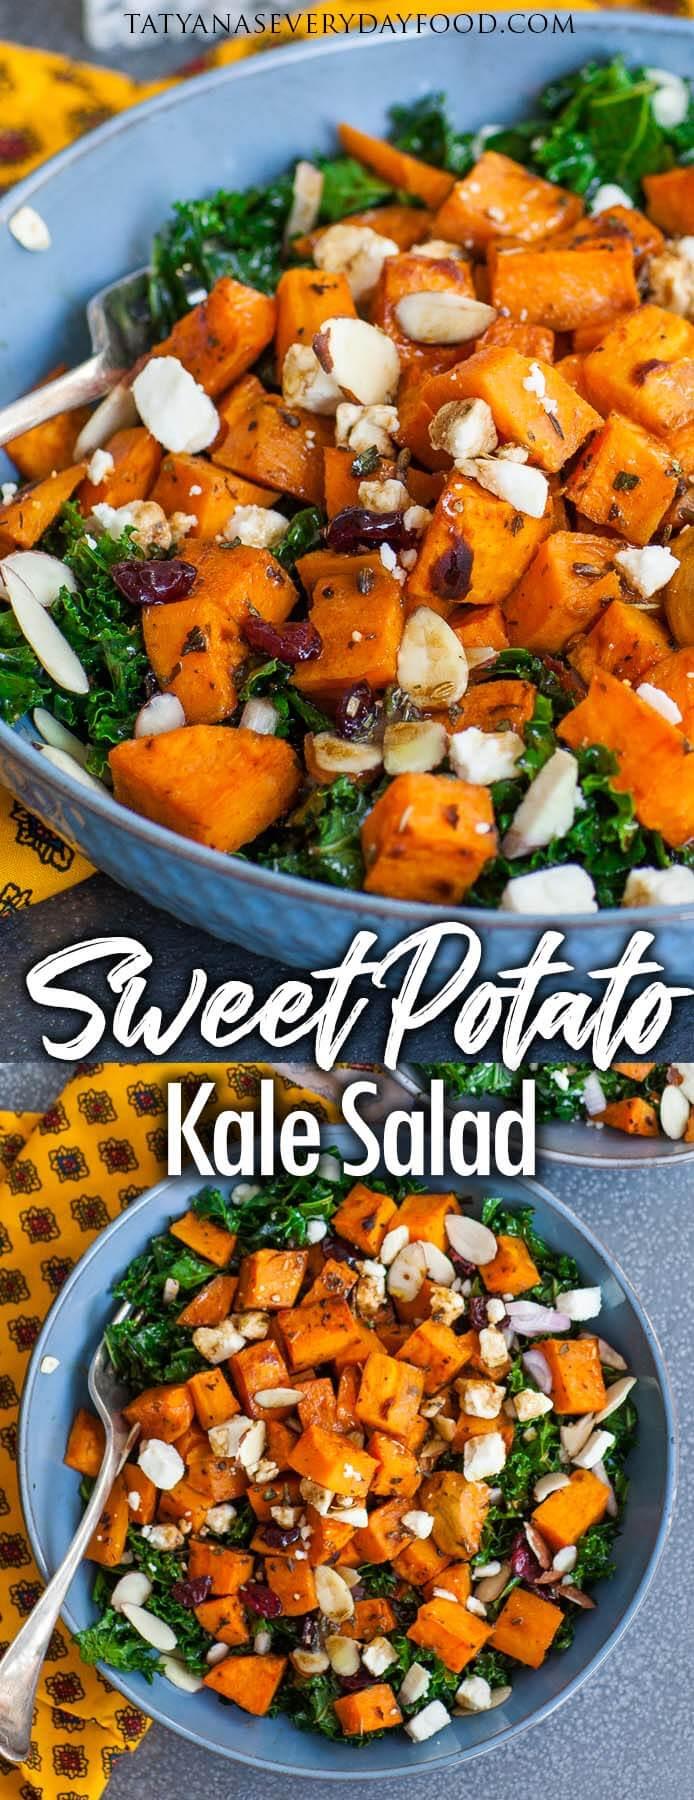 Easy Sweet Potato Kale Salad with video recipe